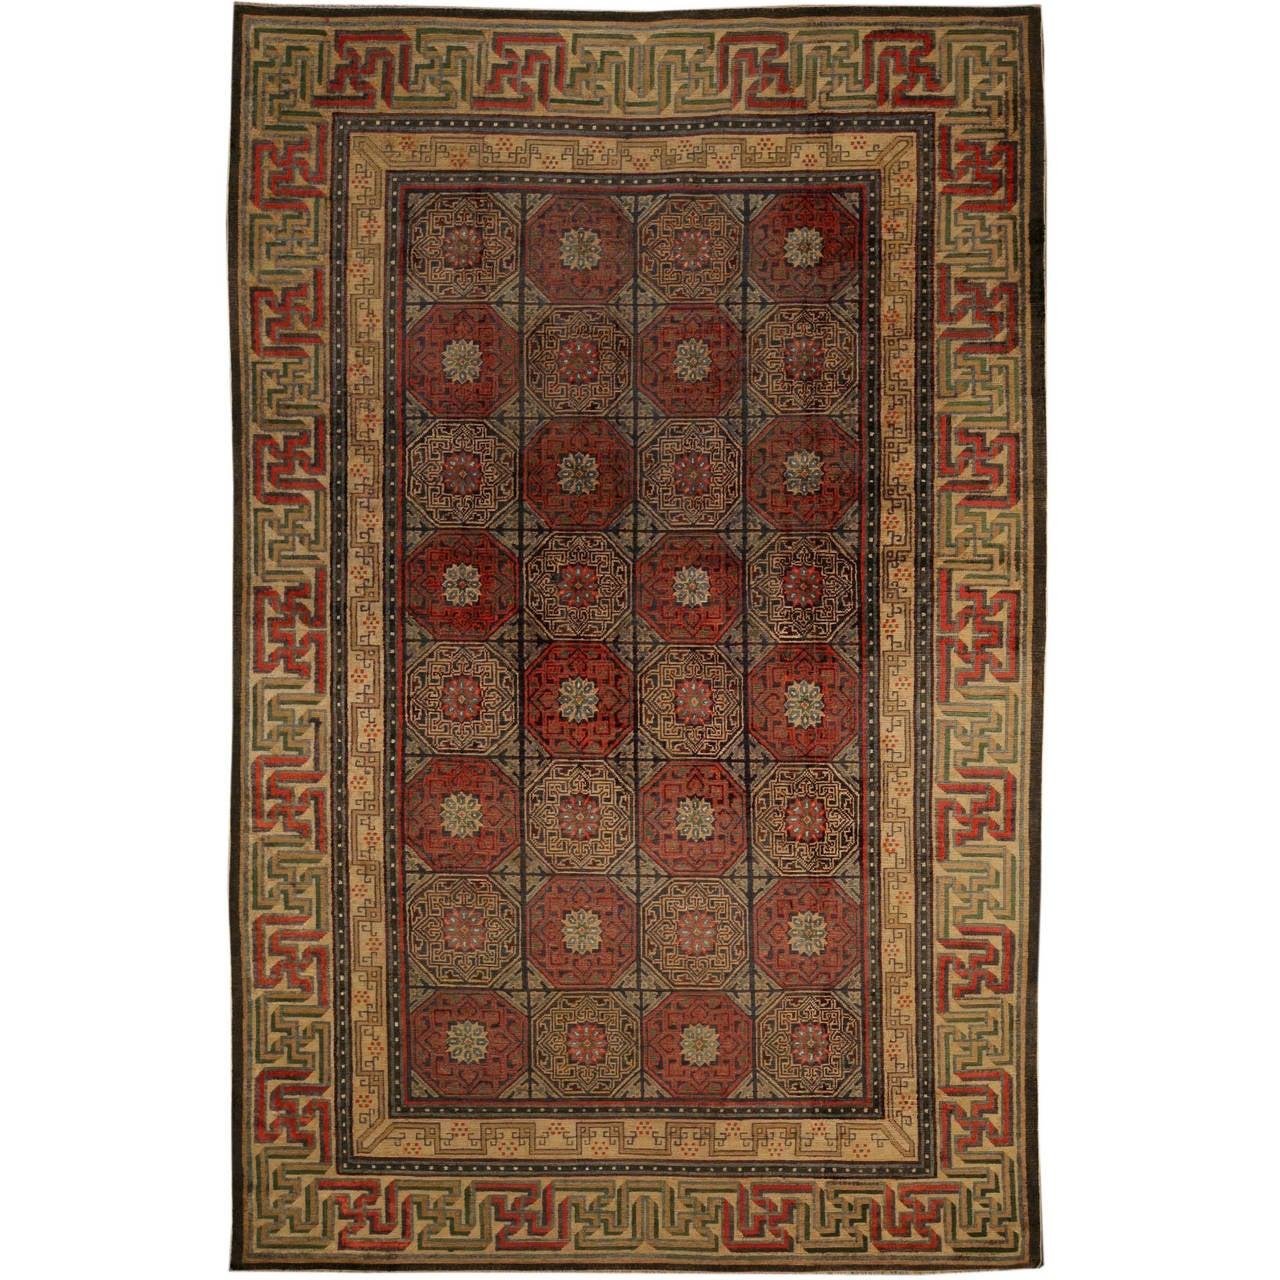 Antique Silk Chinese Rug